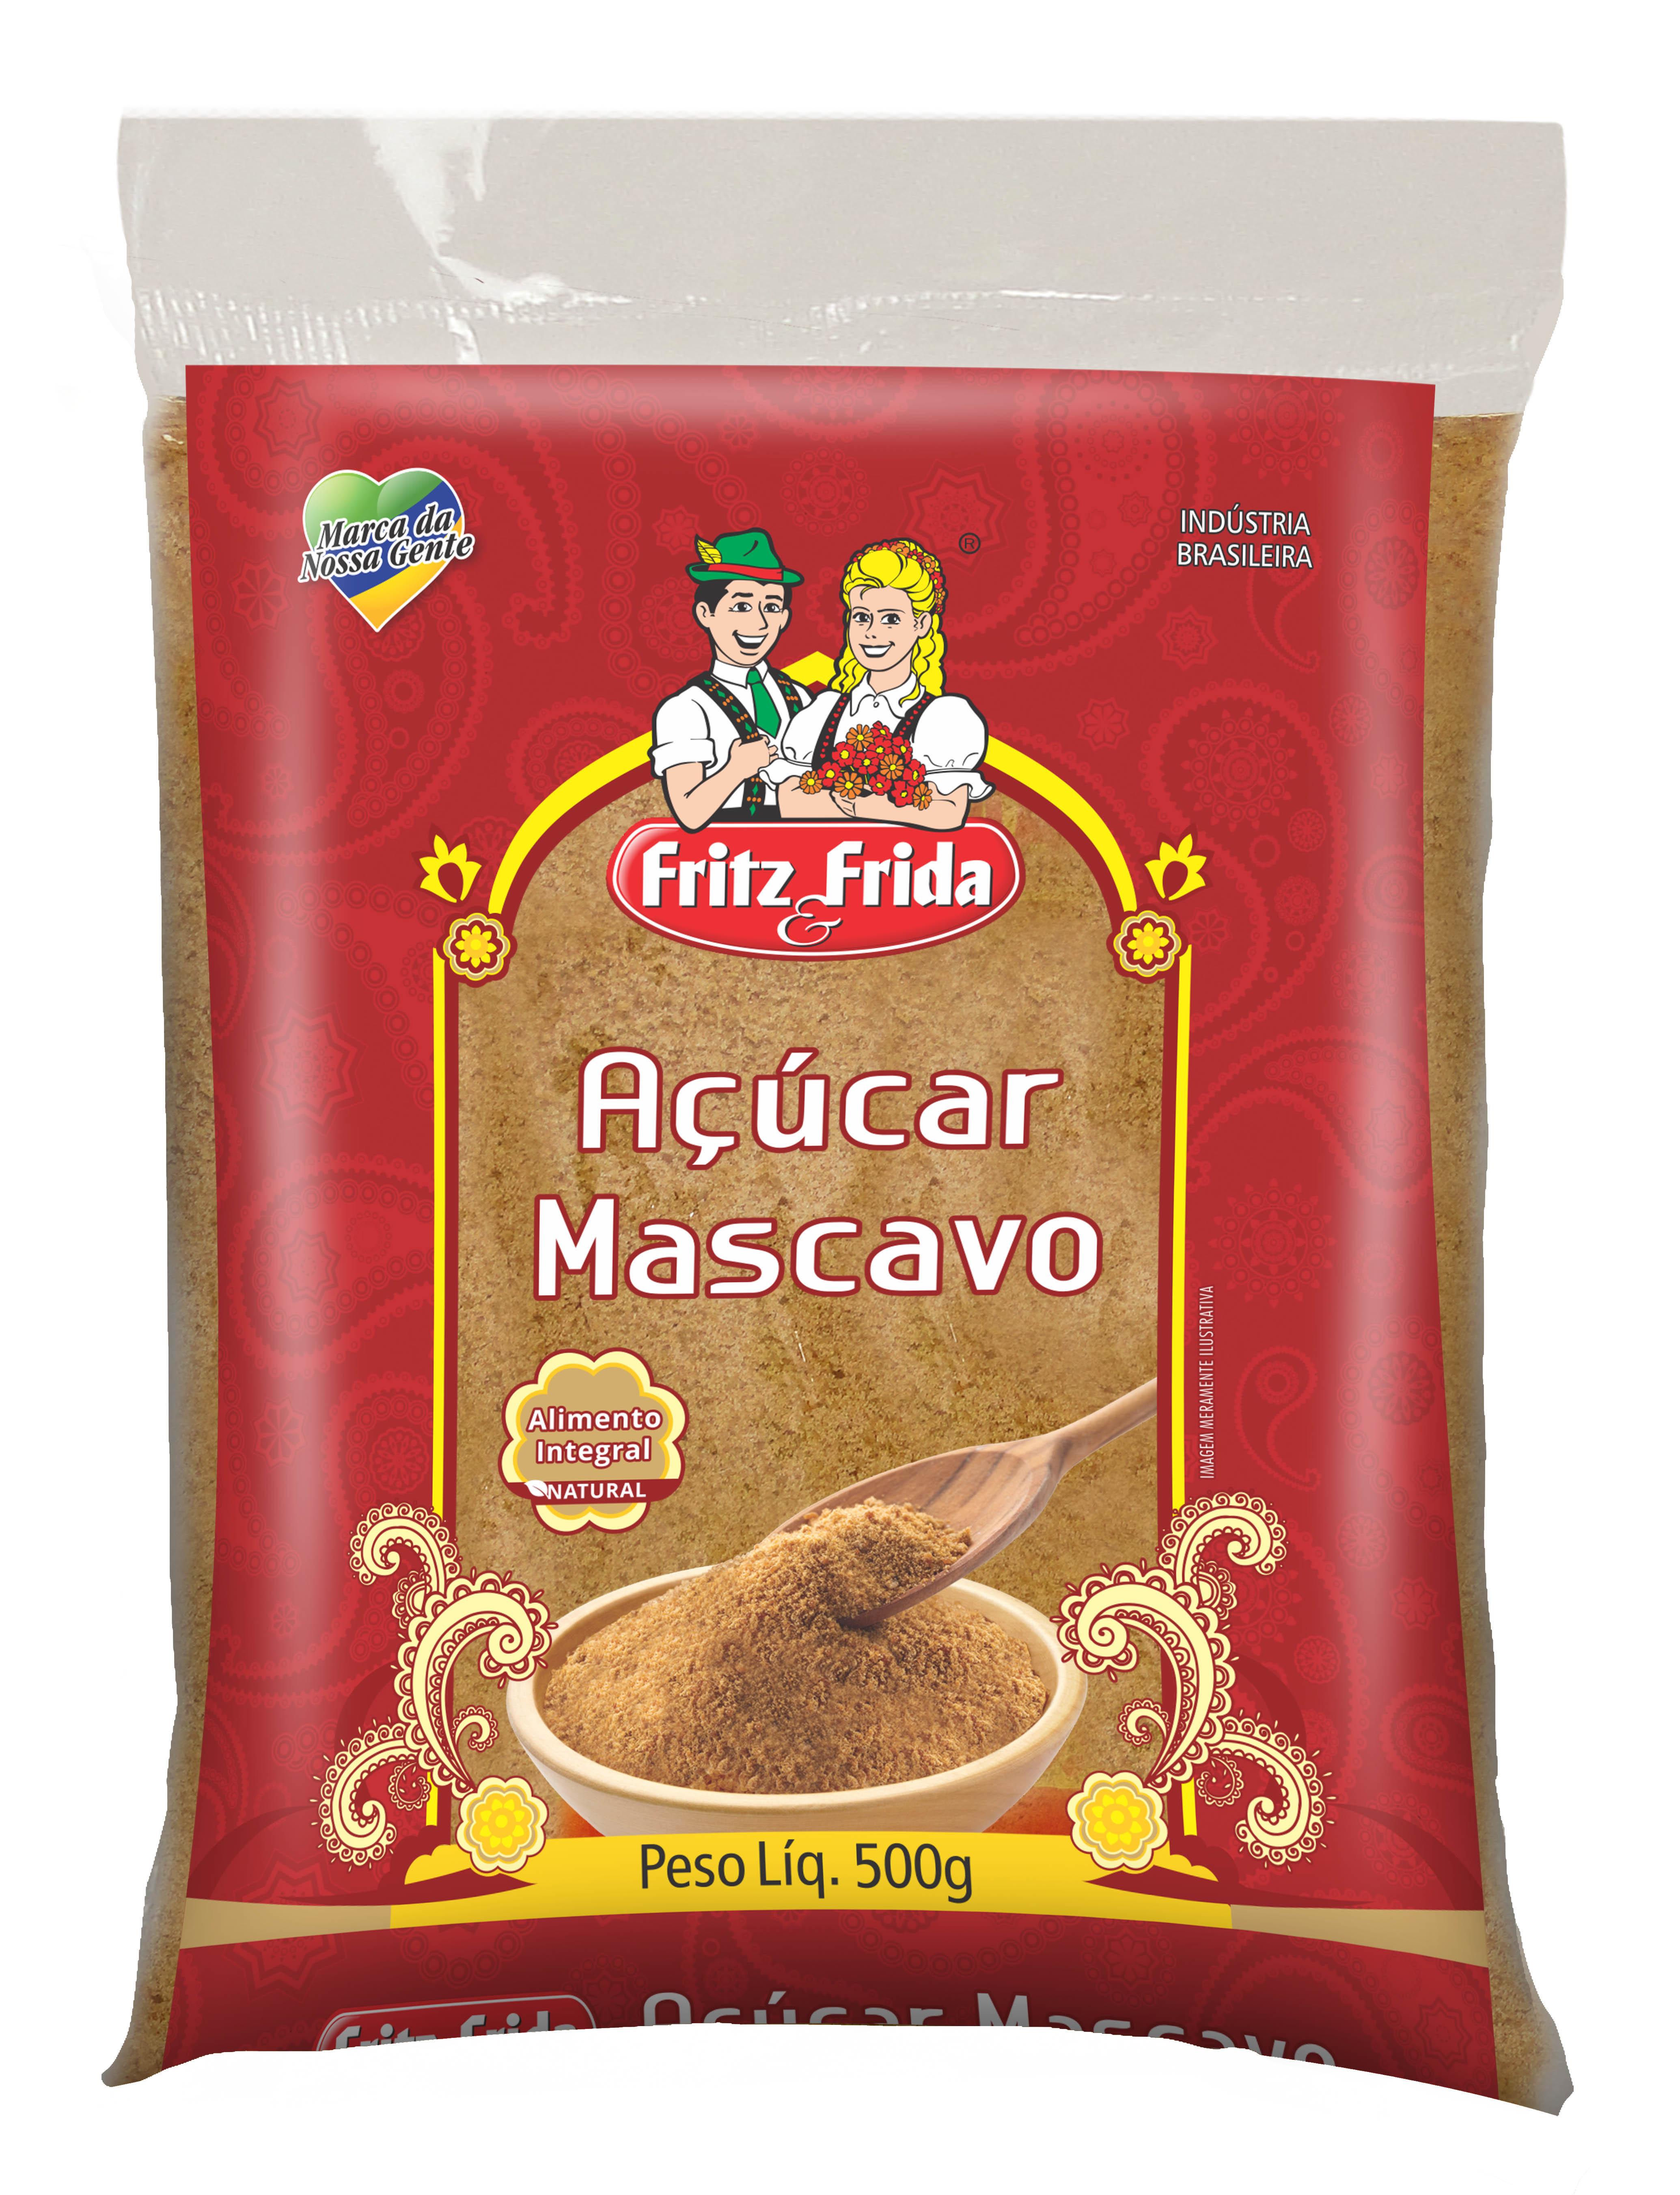 ACUCAR MASCAVO 500G